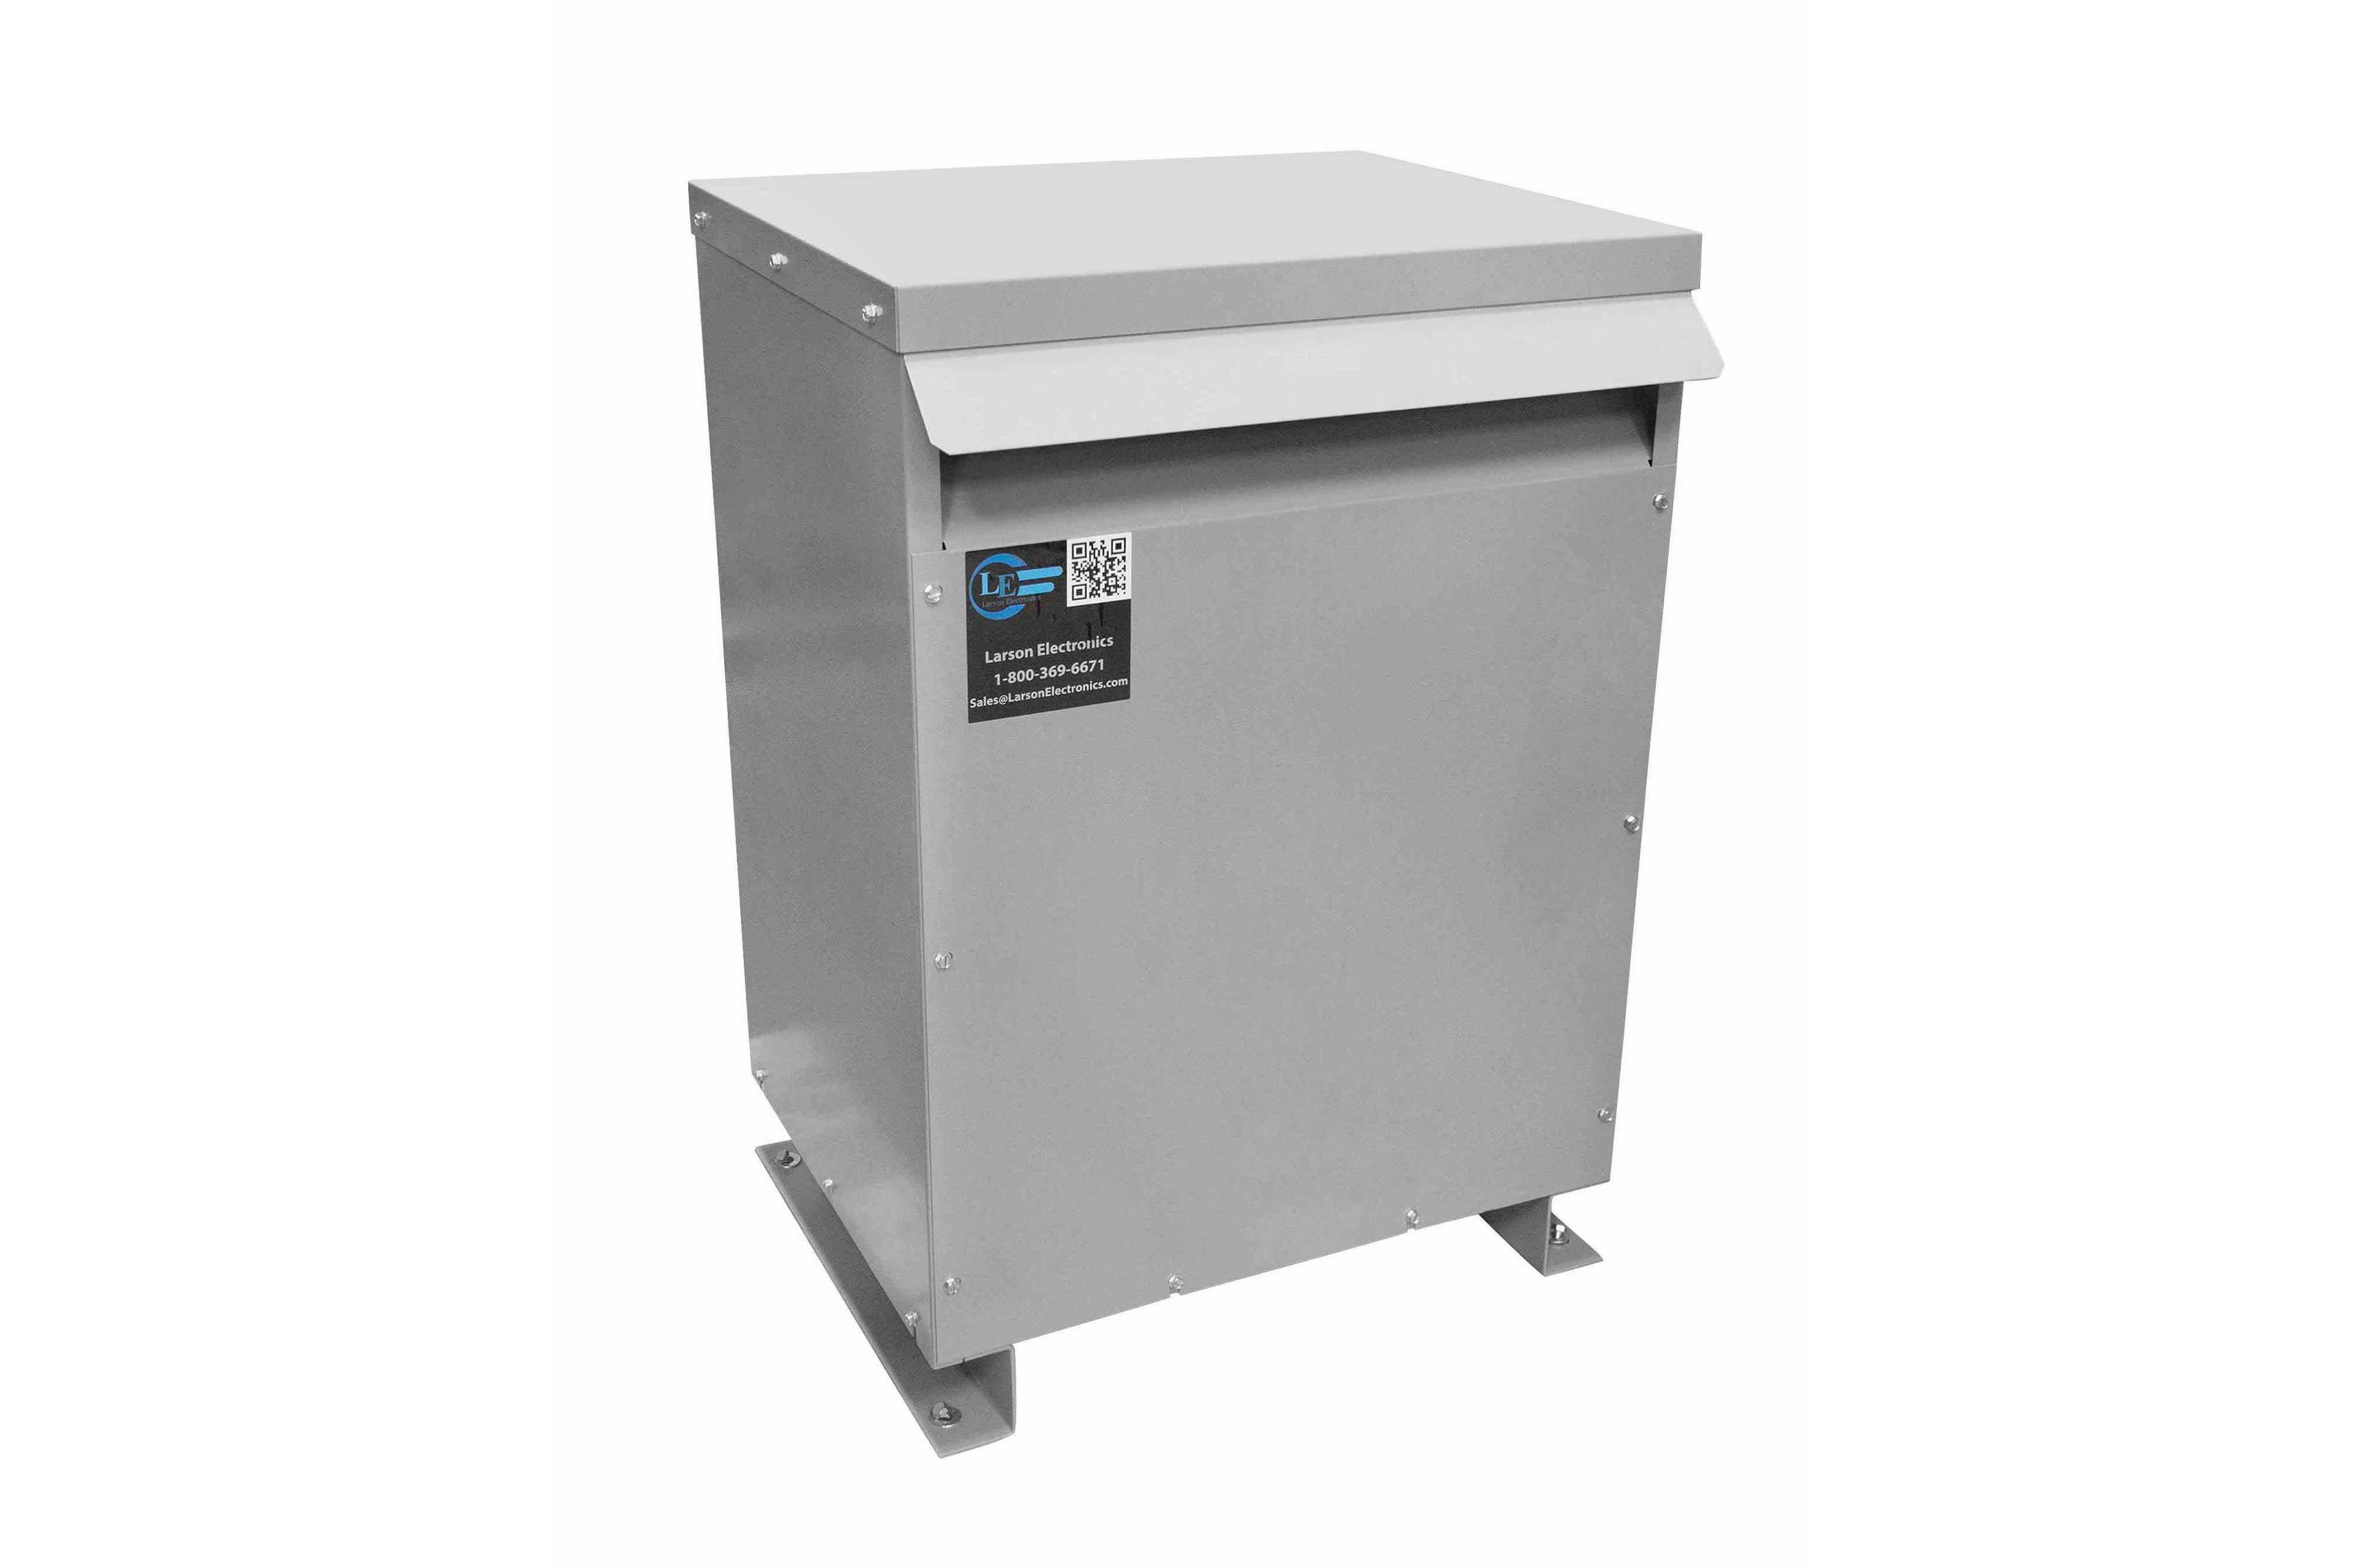 18 kVA 3PH Isolation Transformer, 575V Wye Primary, 240V/120 Delta Secondary, N3R, Ventilated, 60 Hz